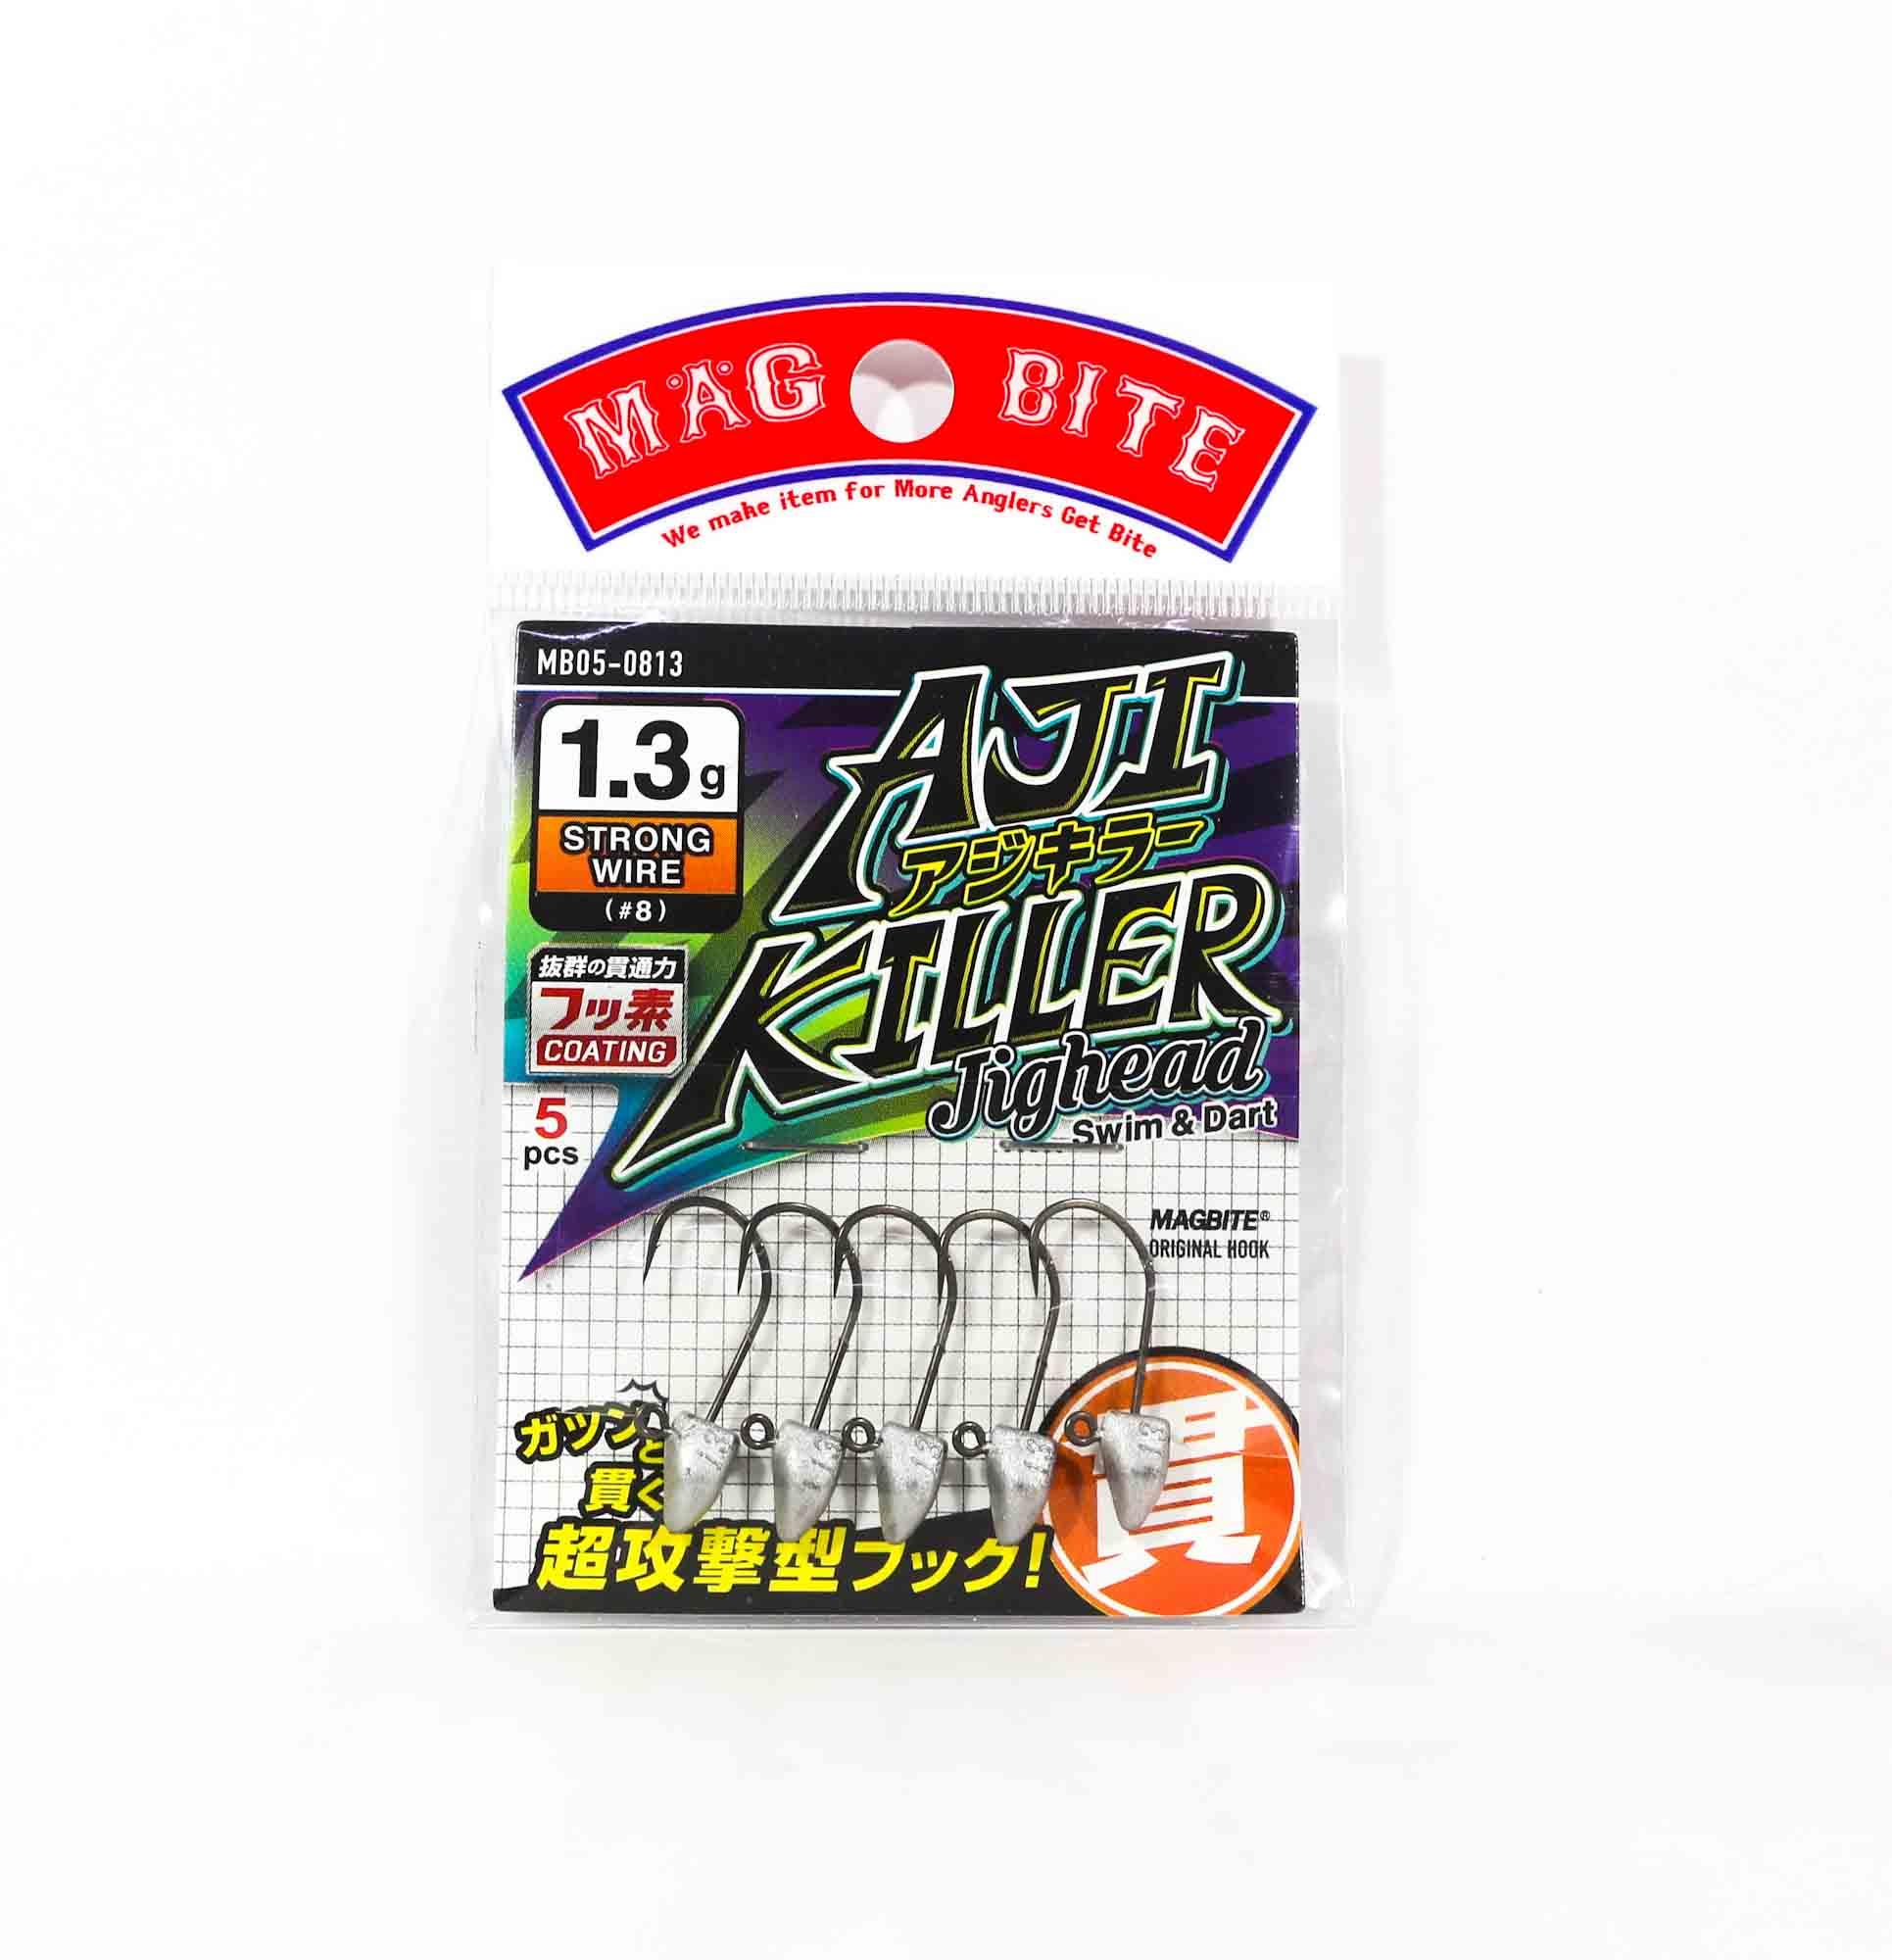 Harimitsu Mag bite Jighead Aji Killer 1.3 grams size 8 (6010)